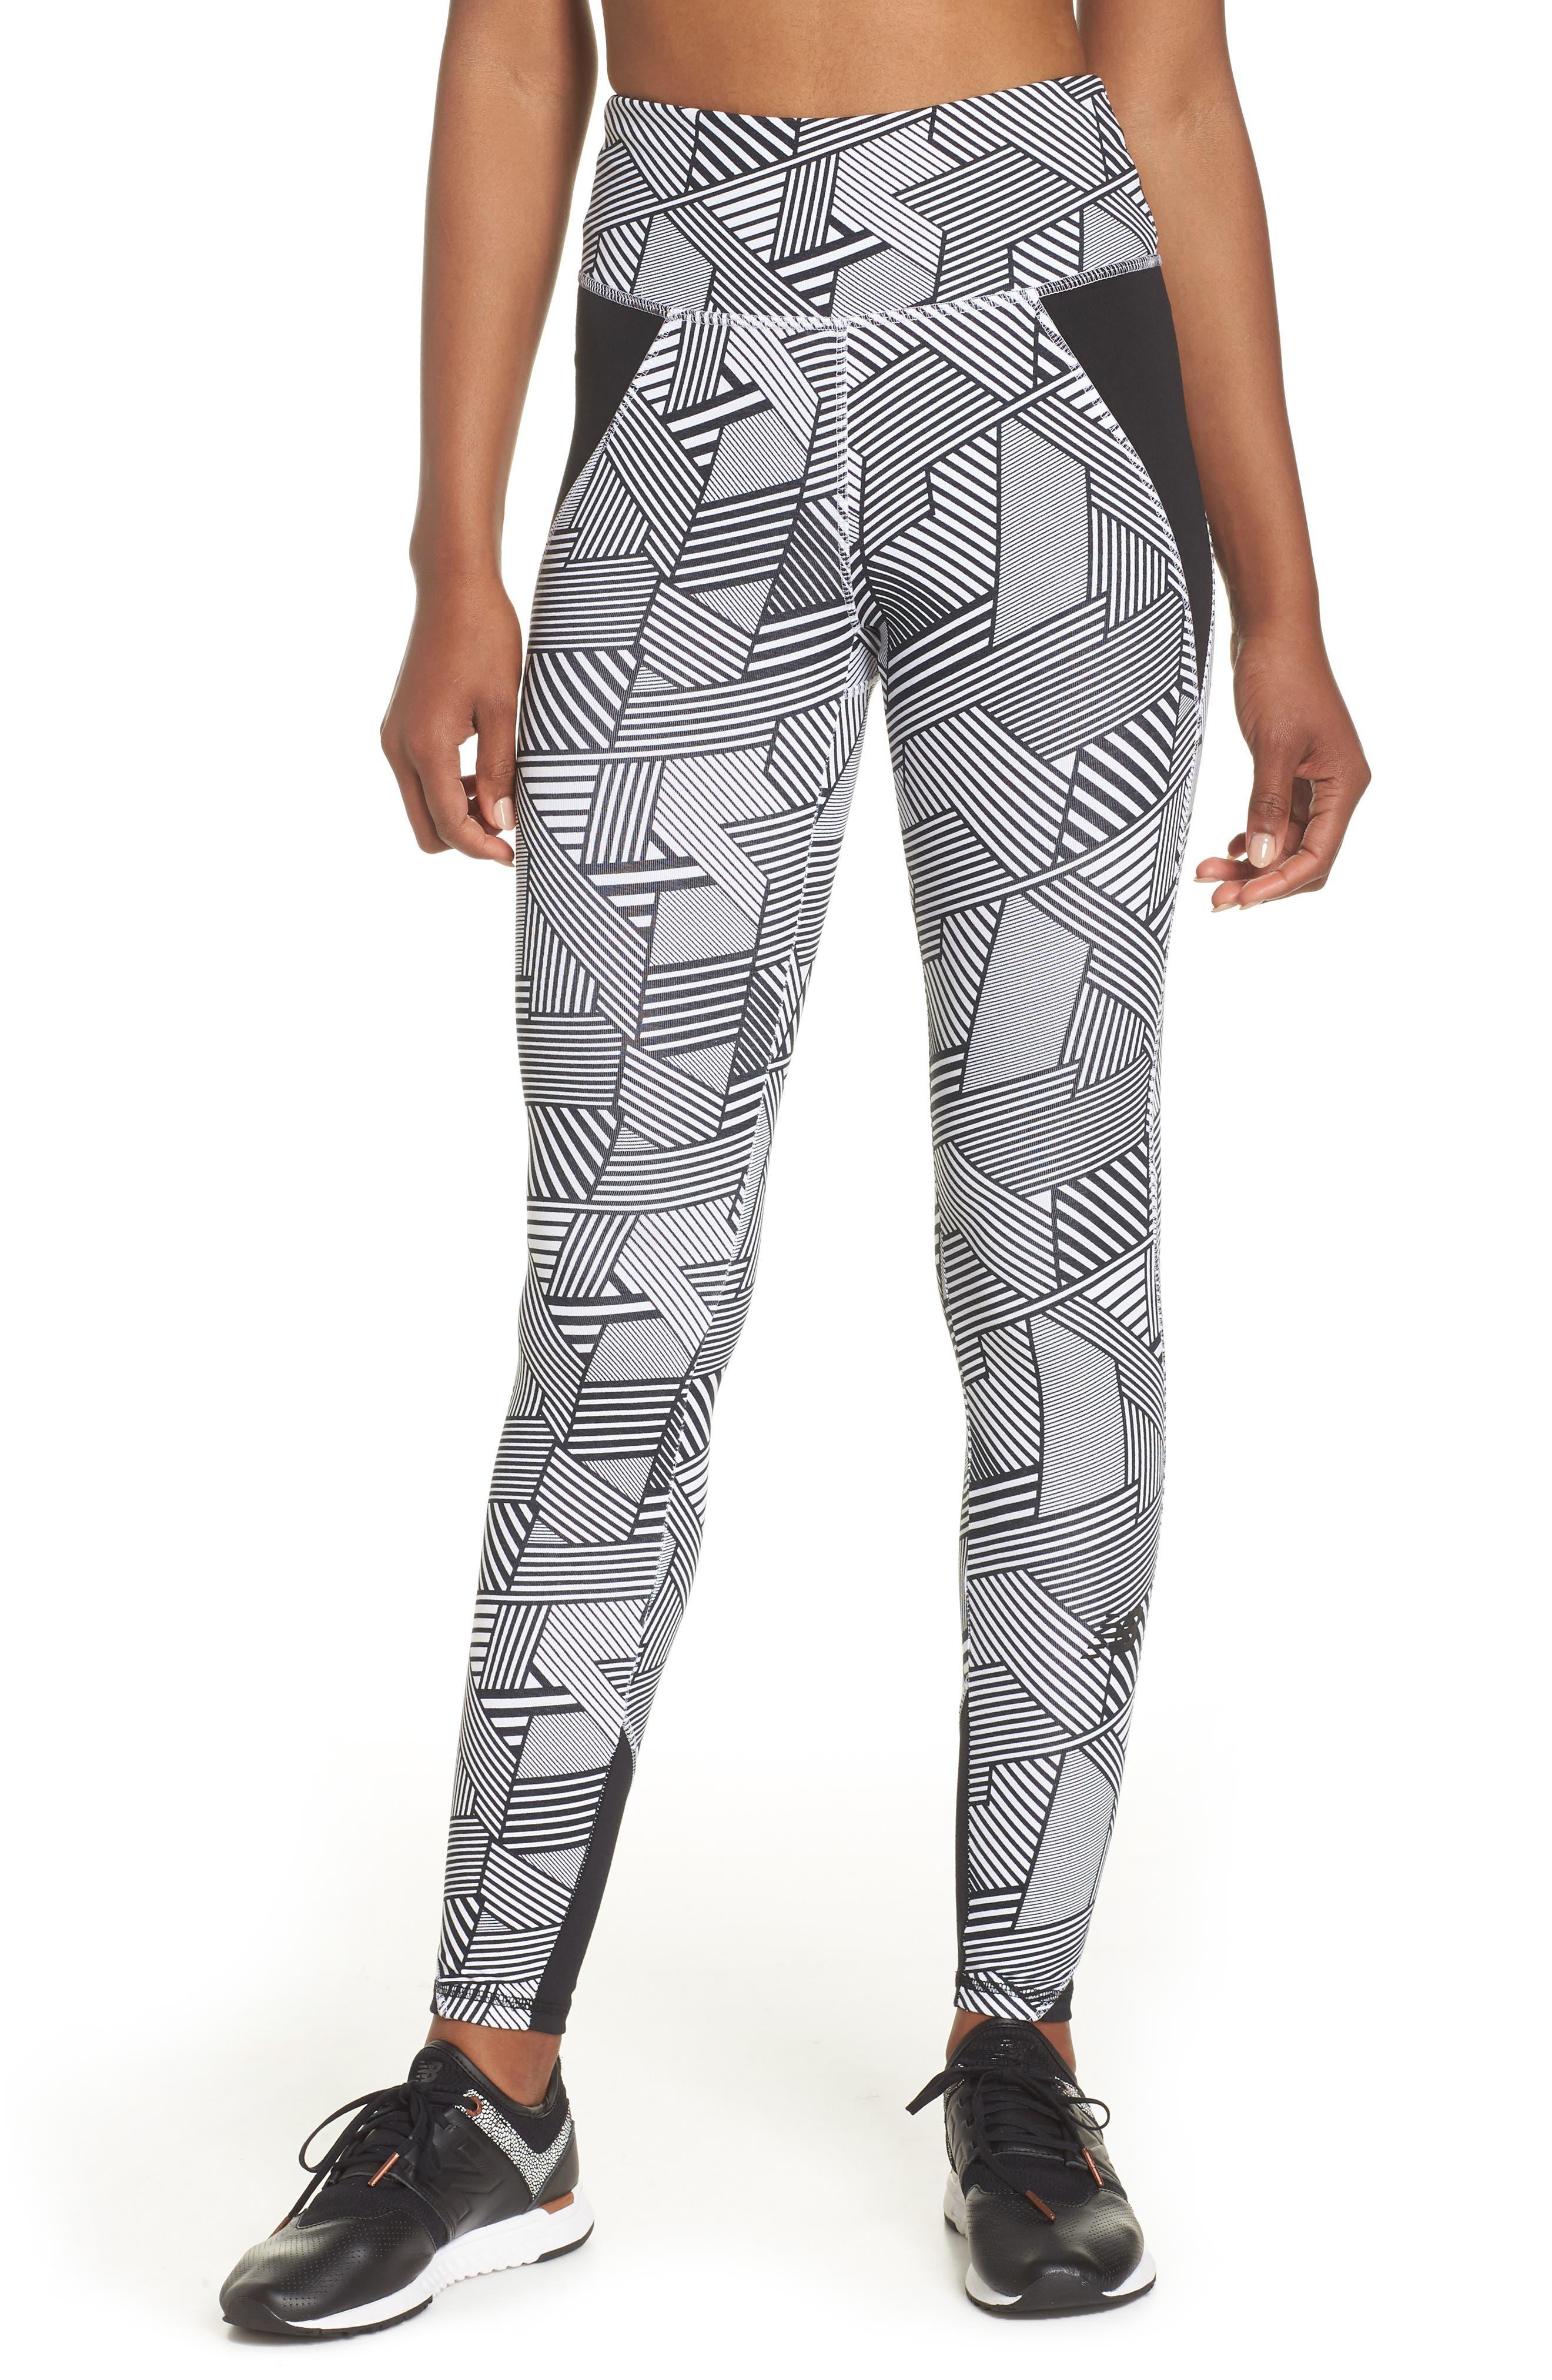 247 Sport Leggings,                         Main,                         color, Black Multi